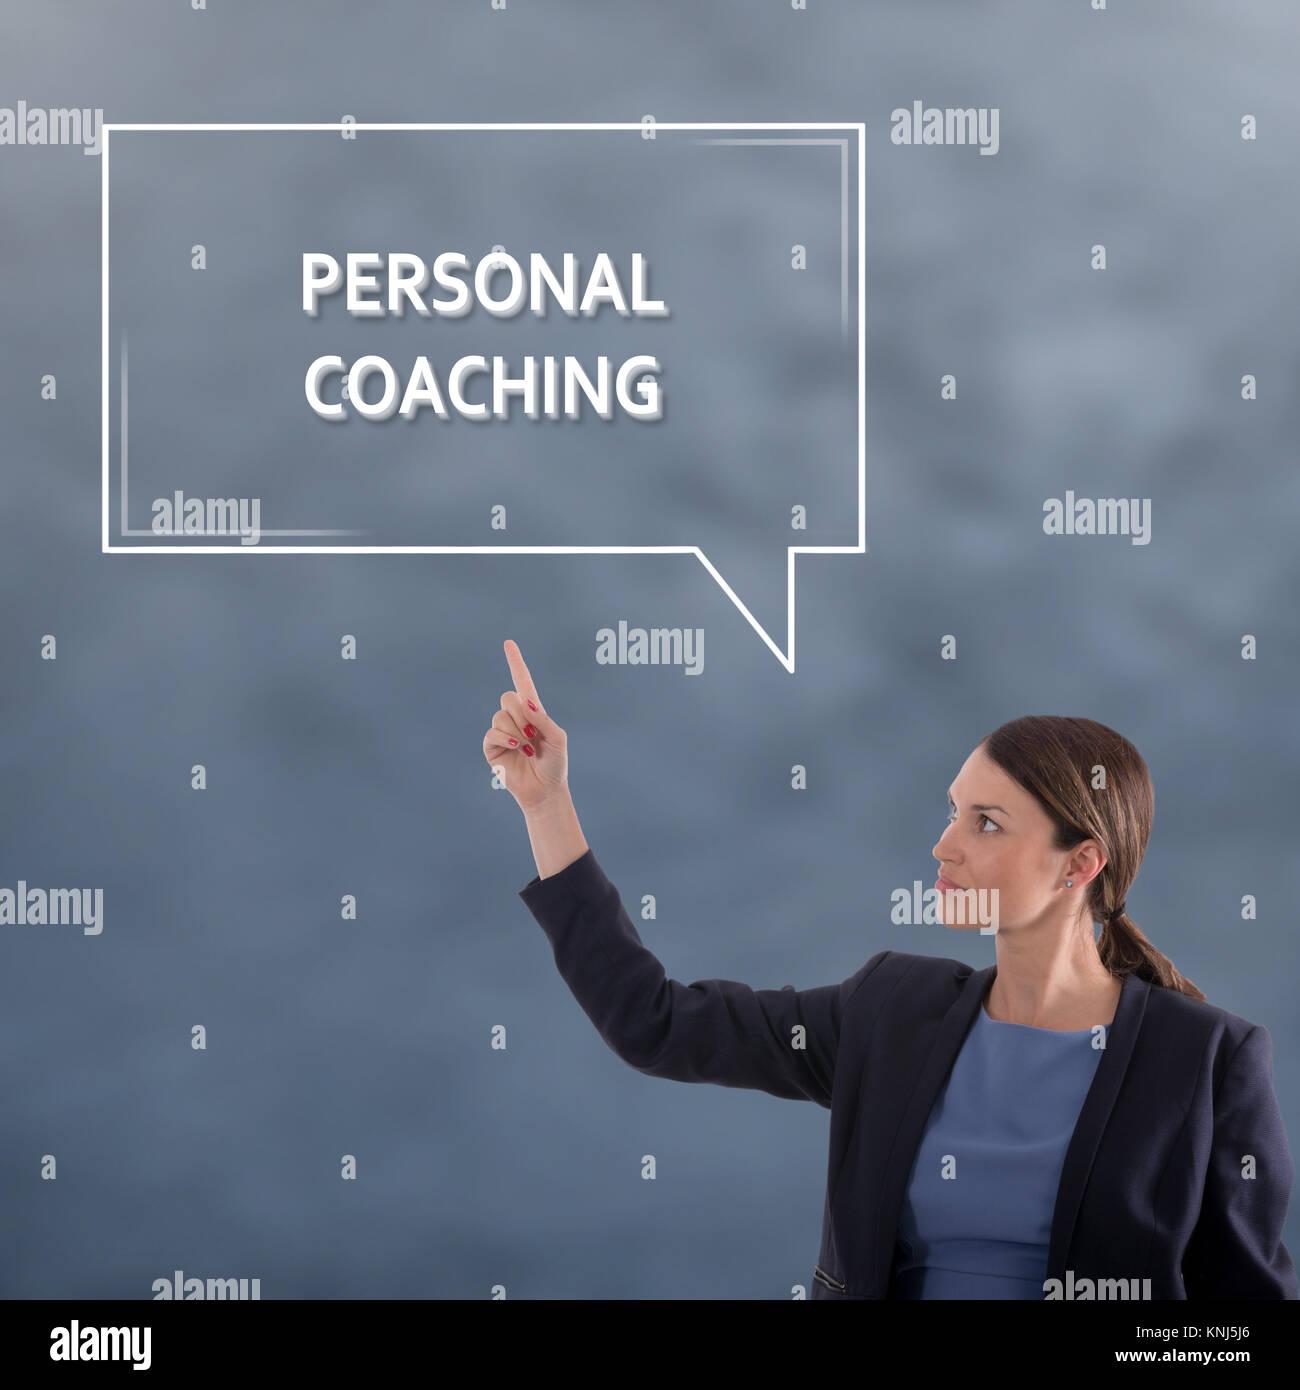 Concepto de negocio coaching personal. Mujer de negocios Concepto Gráfico Imagen De Stock